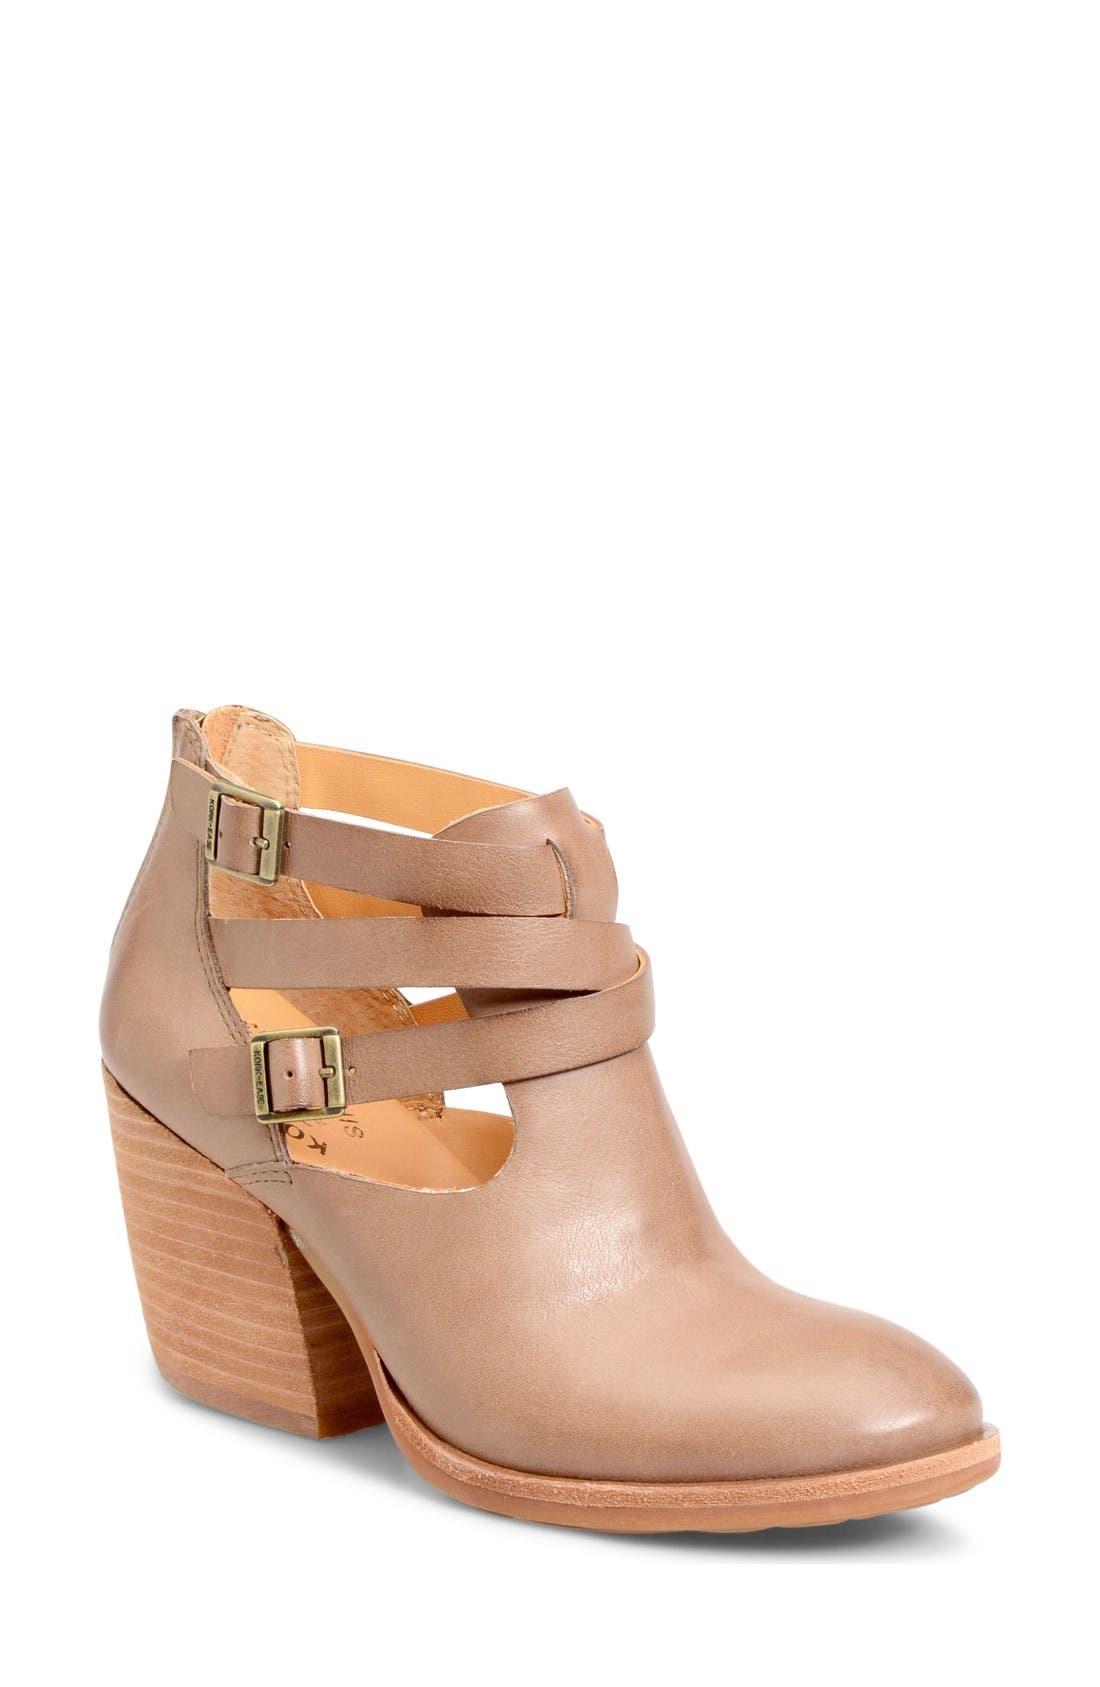 KORK-EASE® 'Stina' Leather Bootie